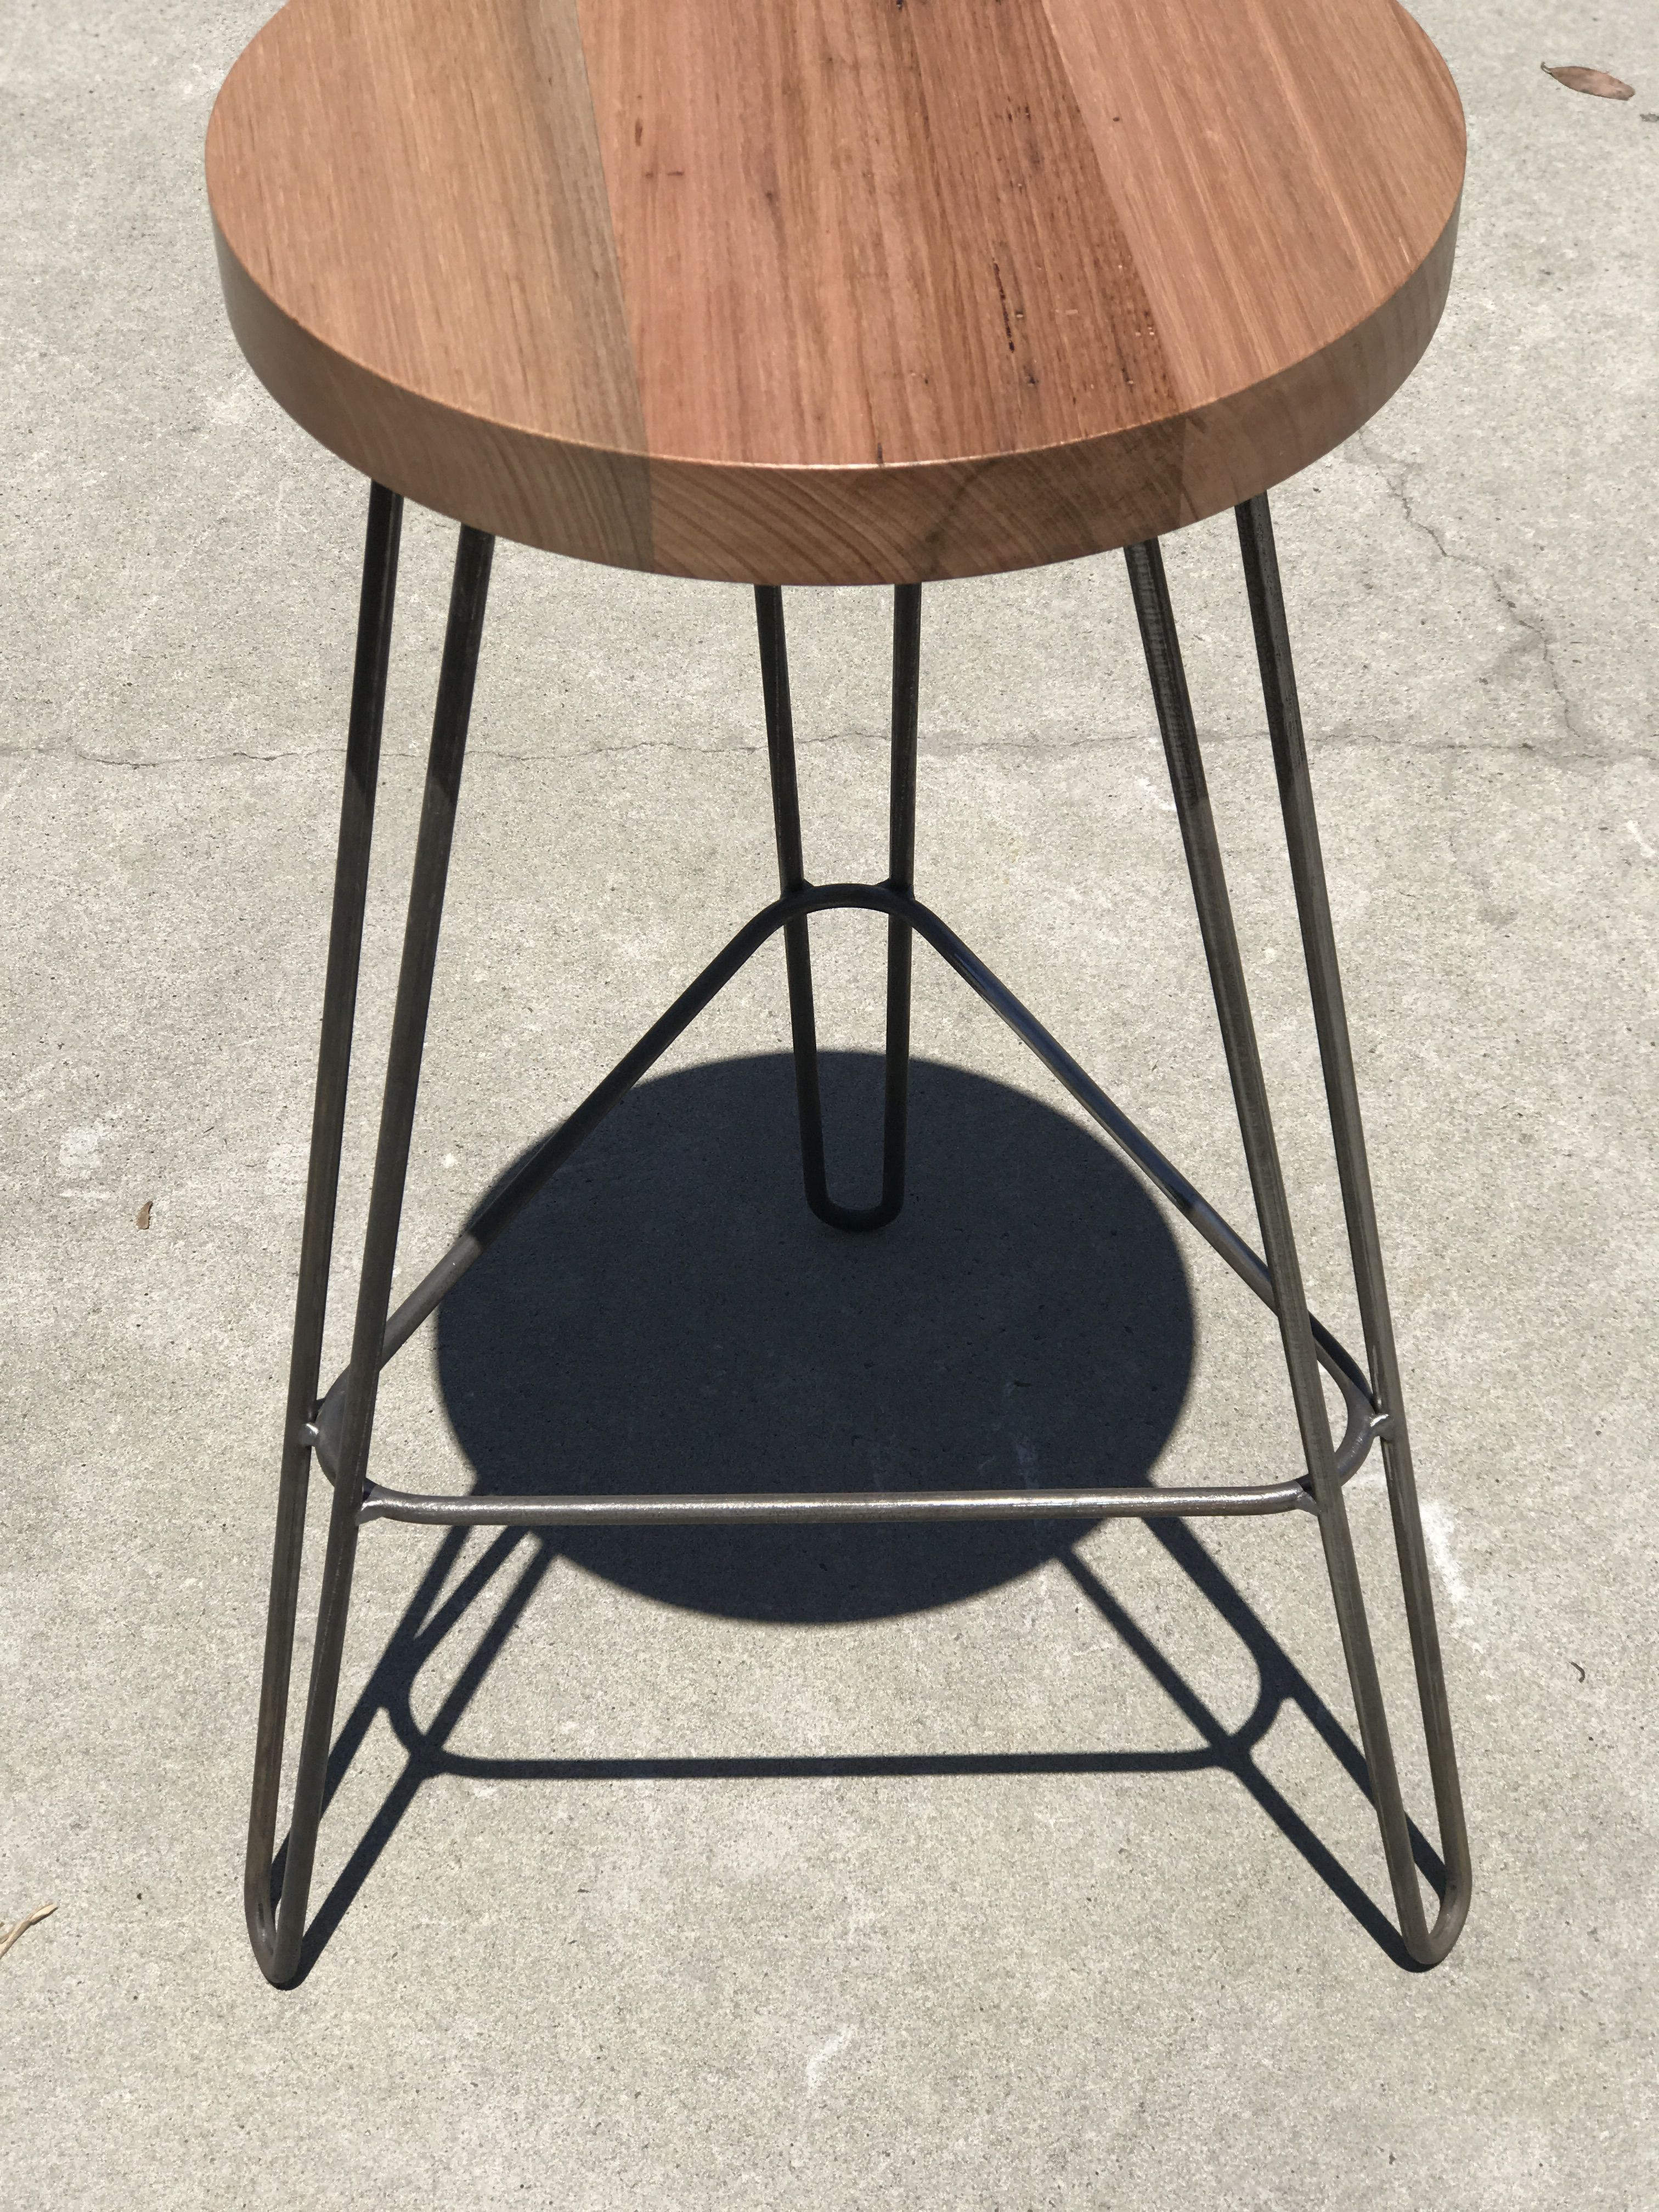 Hairpin Leg Bar Stool Steel Table Legs Oversized Chair Living Room Steel Table